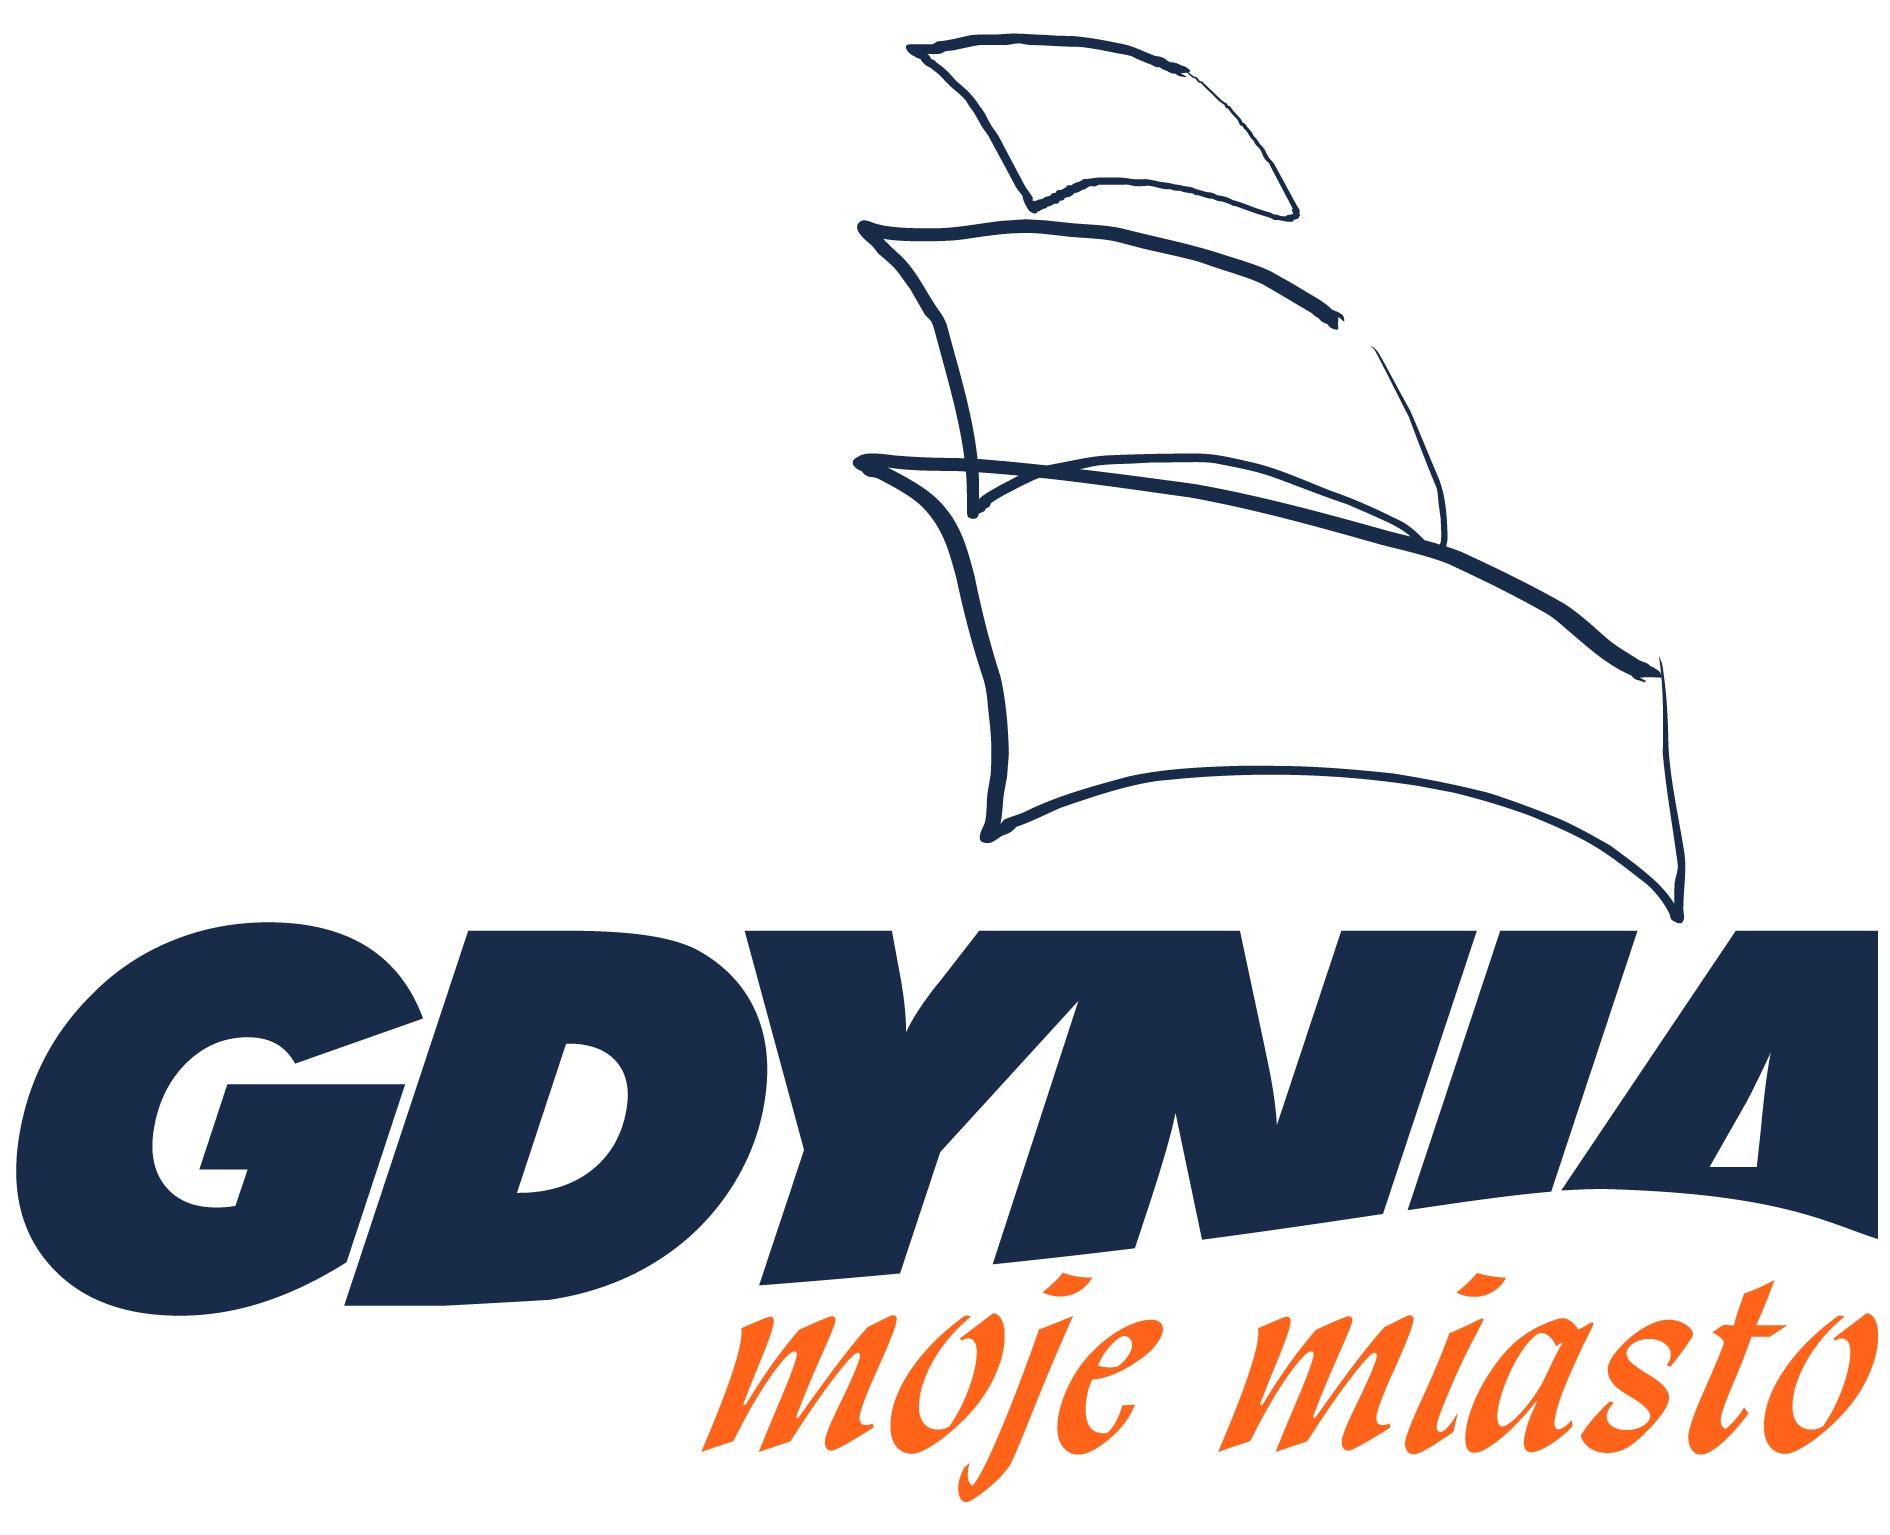 logo Gdyni